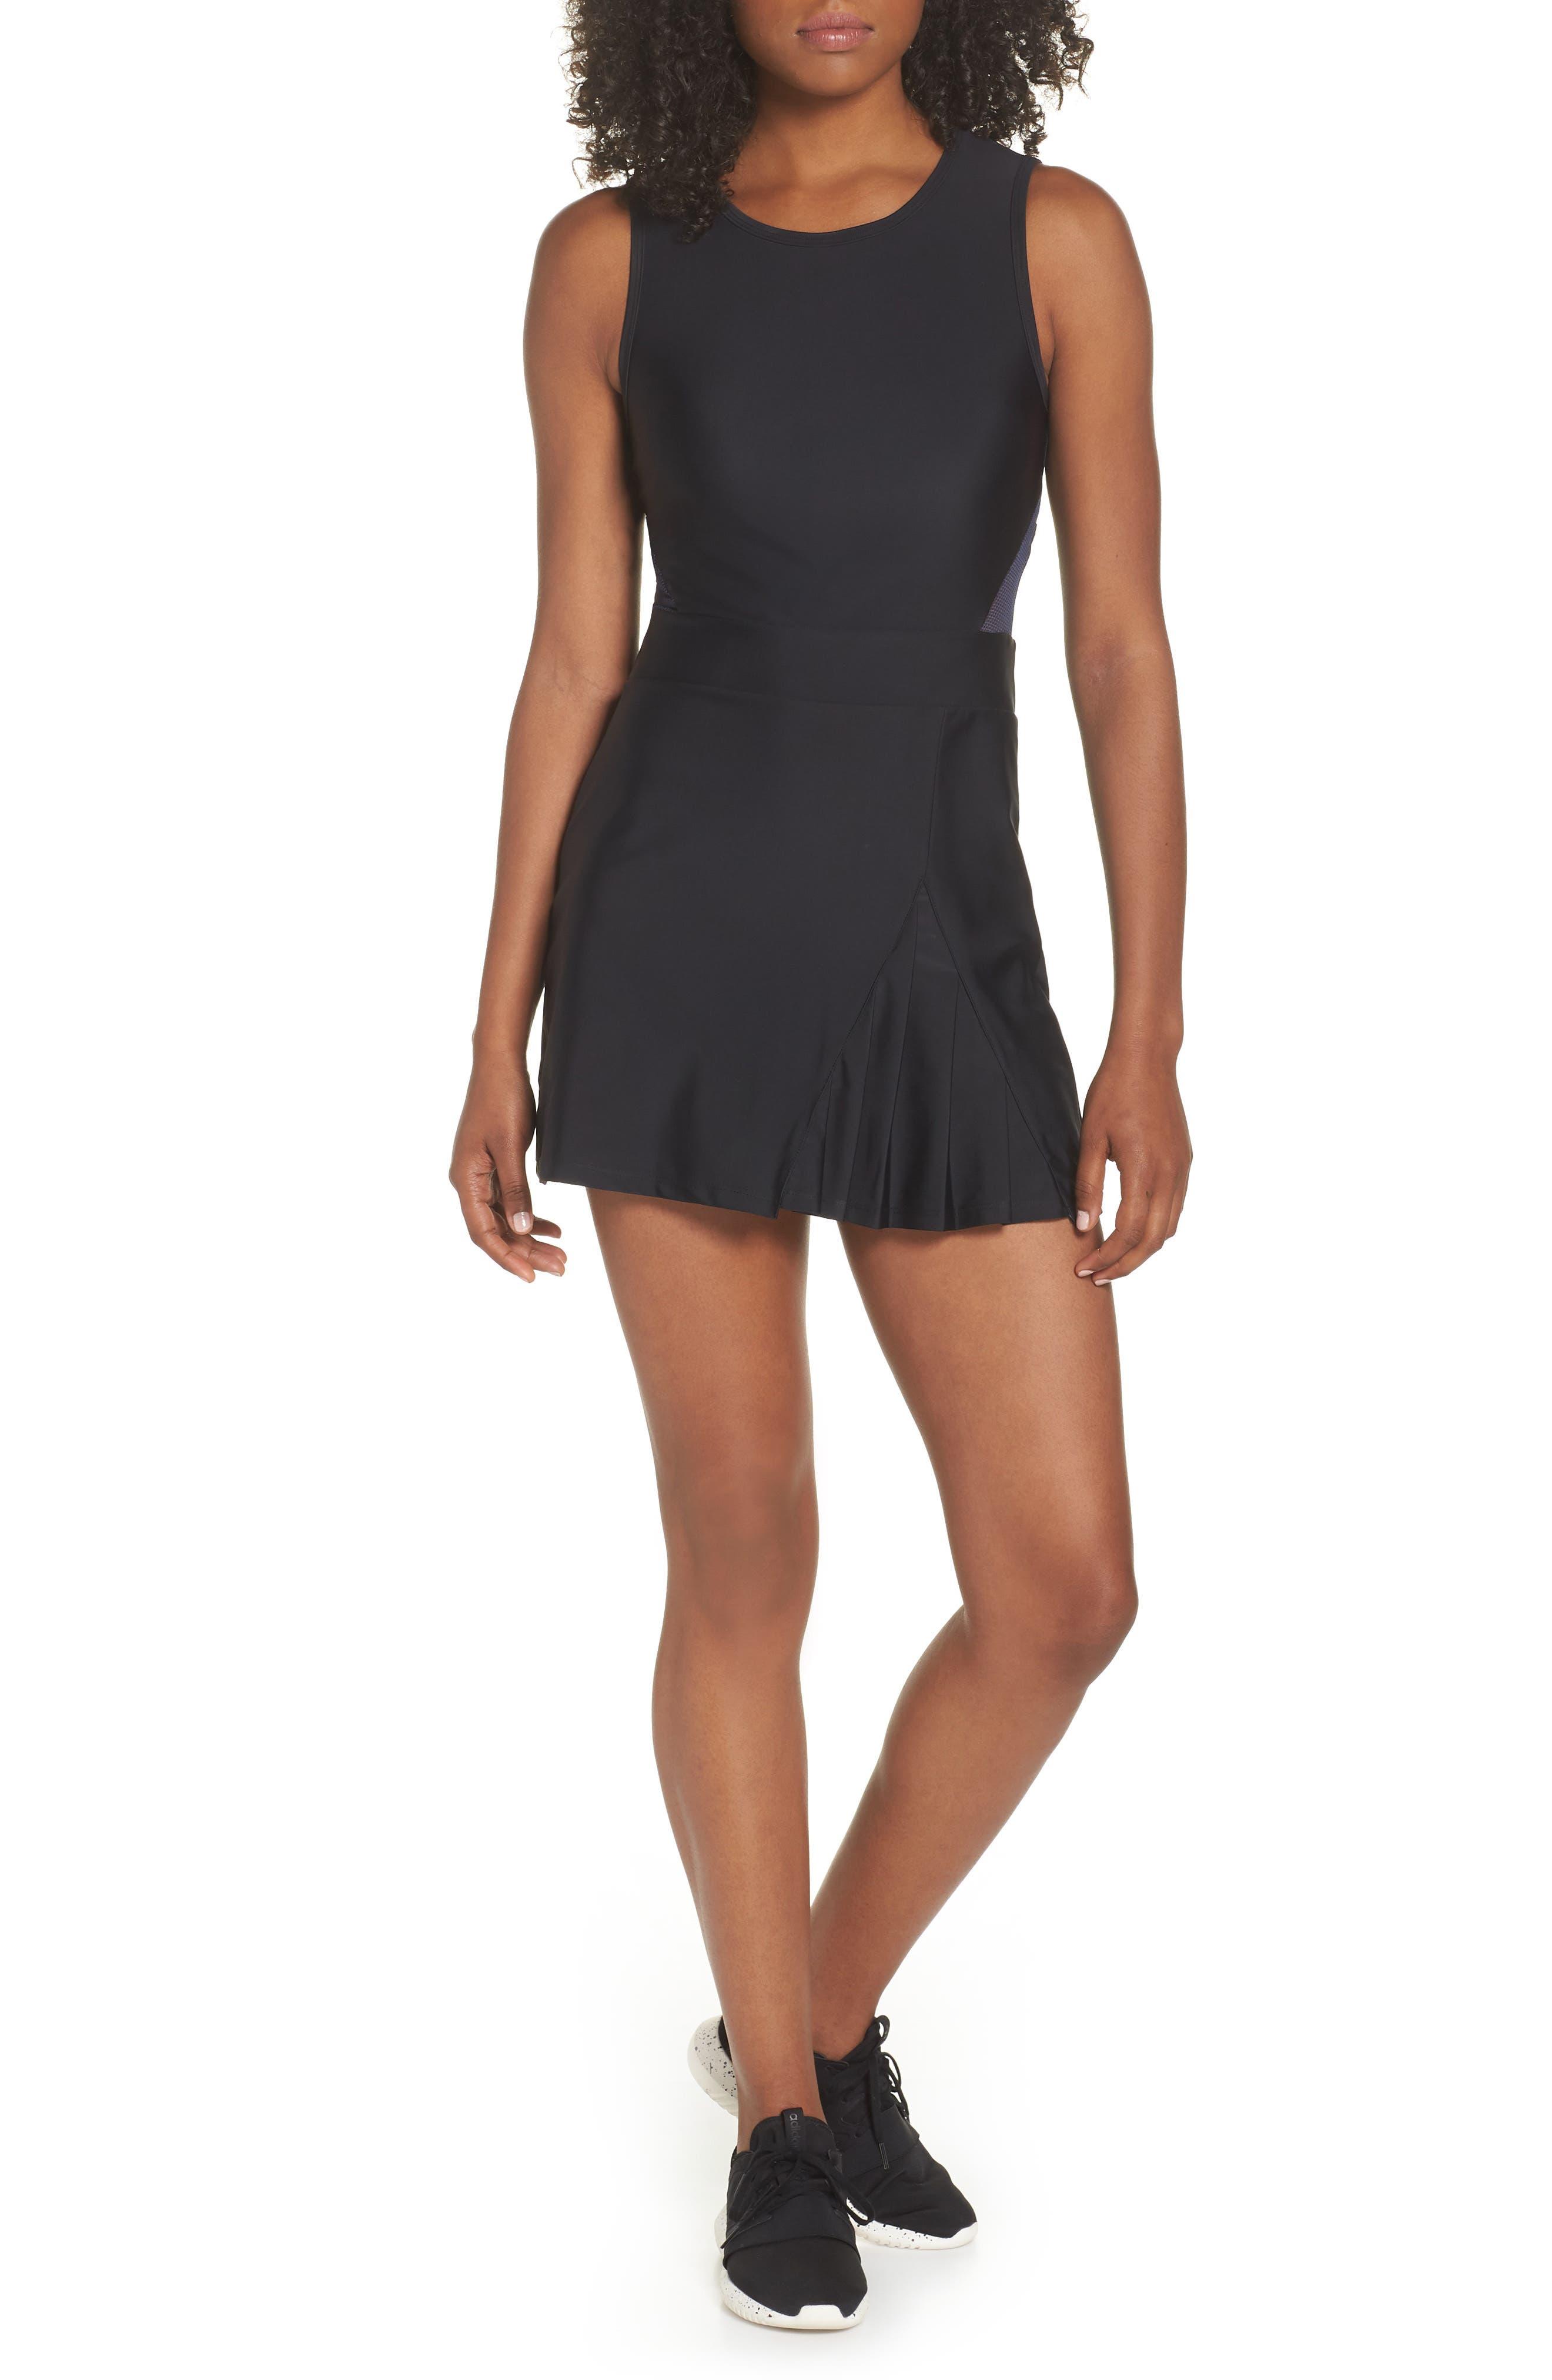 BoomBoom Athletica Tennis Dress,                         Main,                         color, Black/ Navy